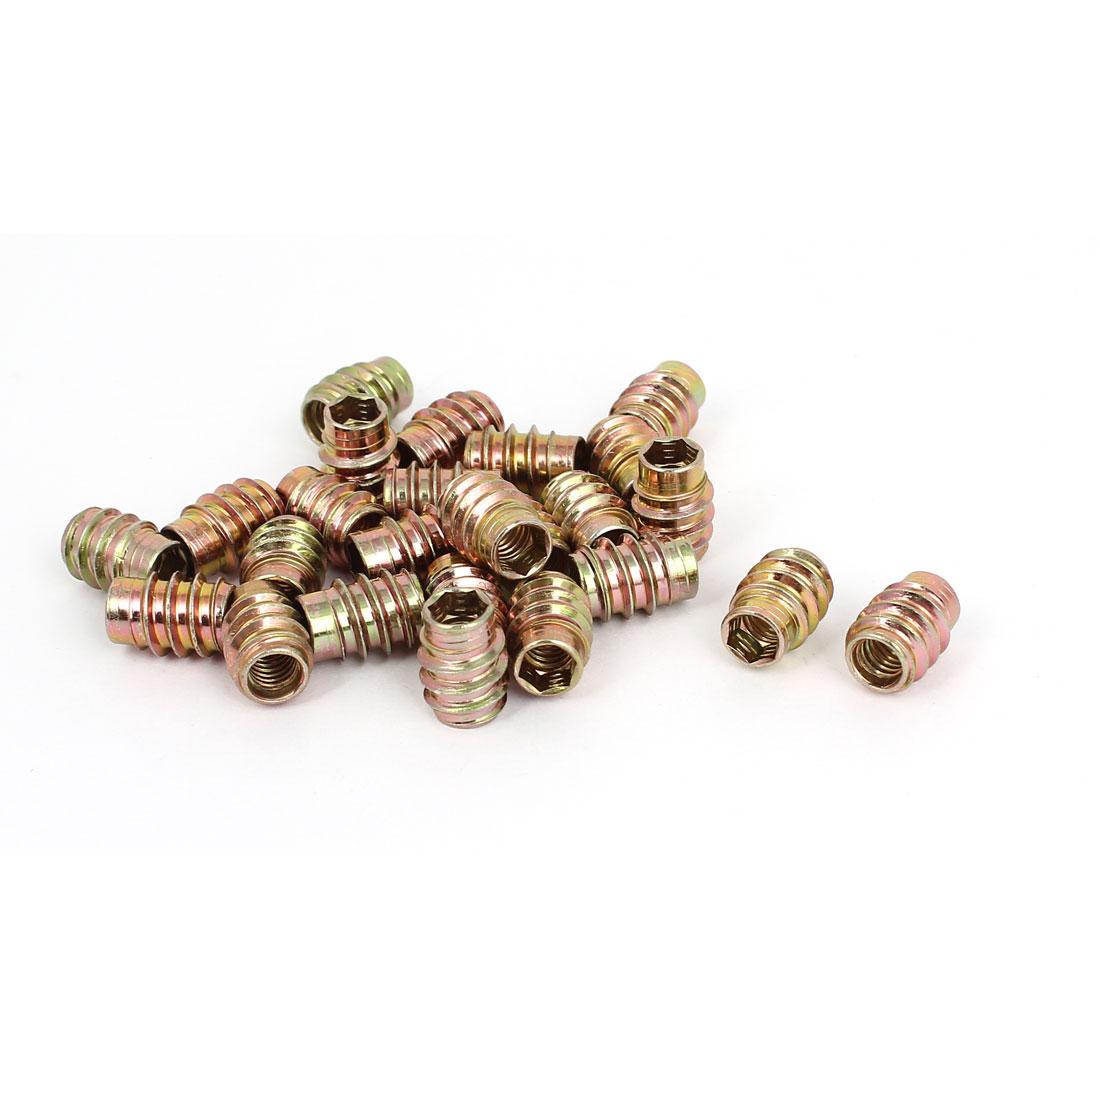 Furniture Fittings M6 Hex Socket Dowel Insert E-Nut Screws Nuts 15mm Long 25 Pcs